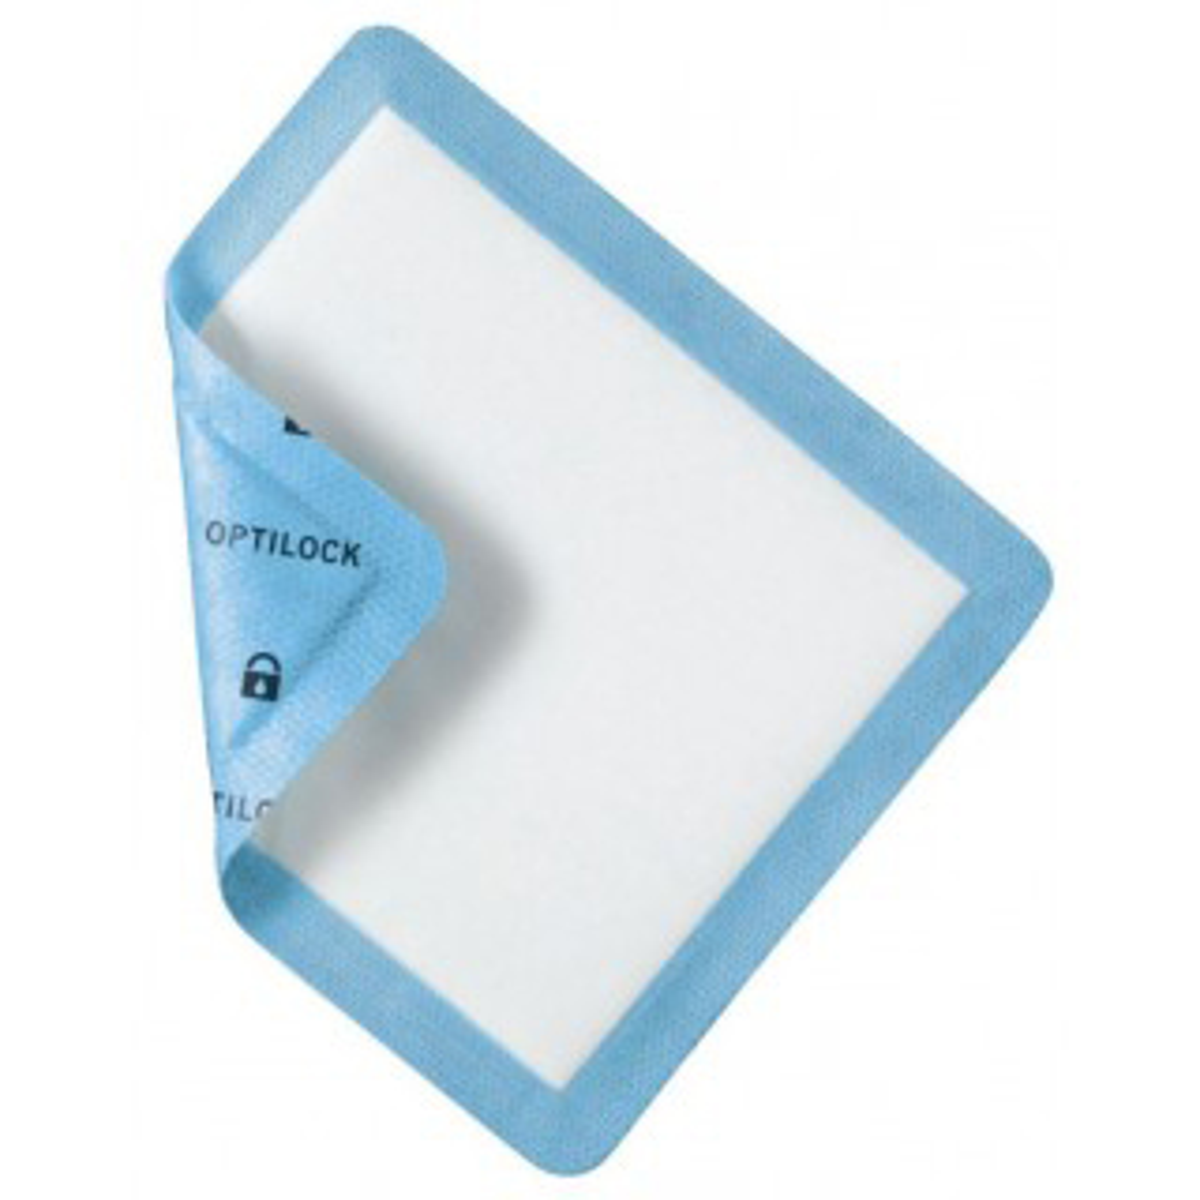 Medline OptiLock Non-Adhesive Foam Dressing, 8 Inch x 12 Inch